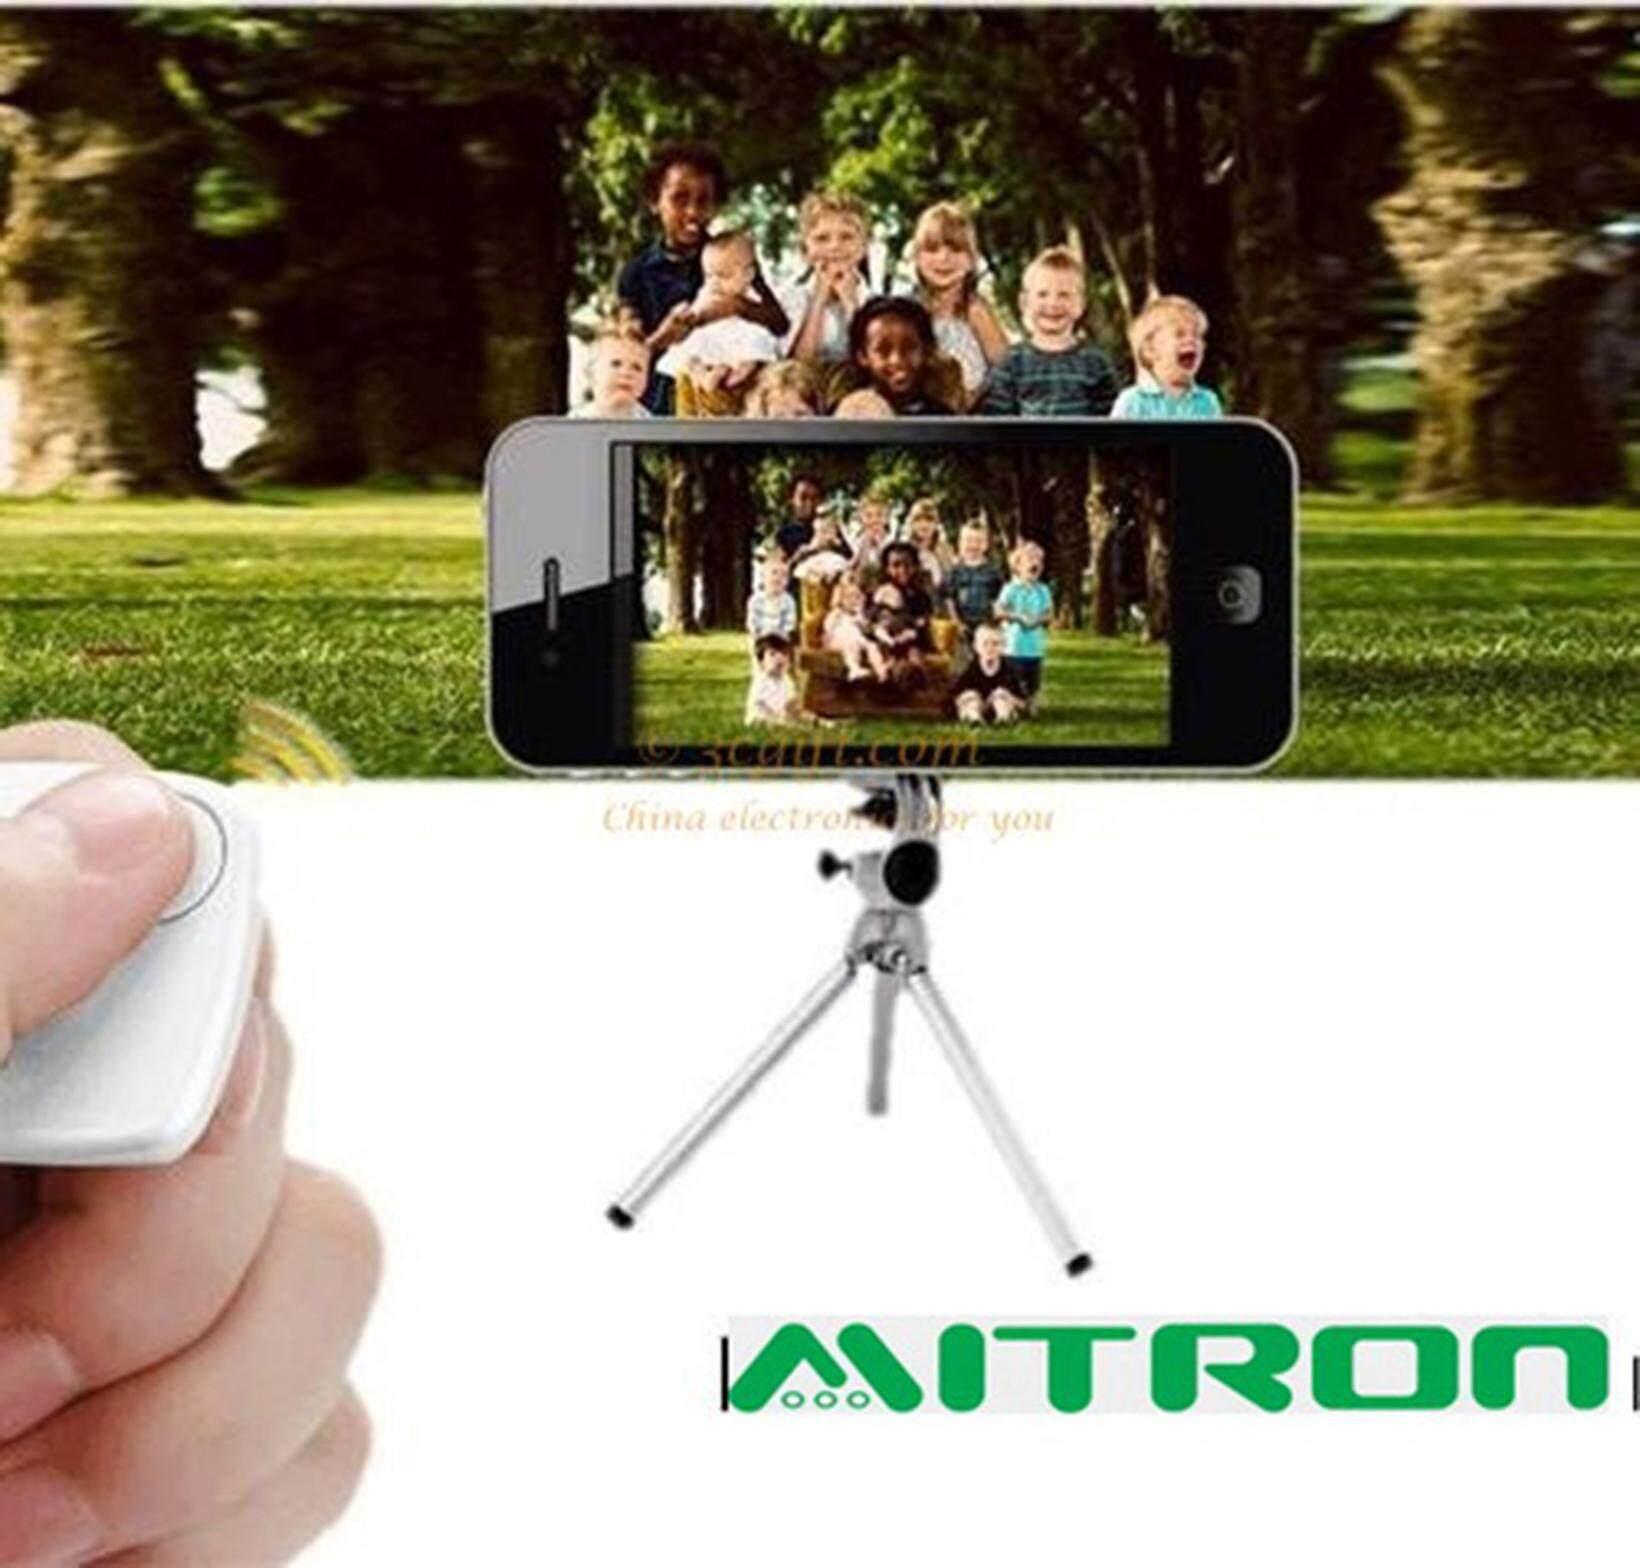 Selfile mitron.jpg